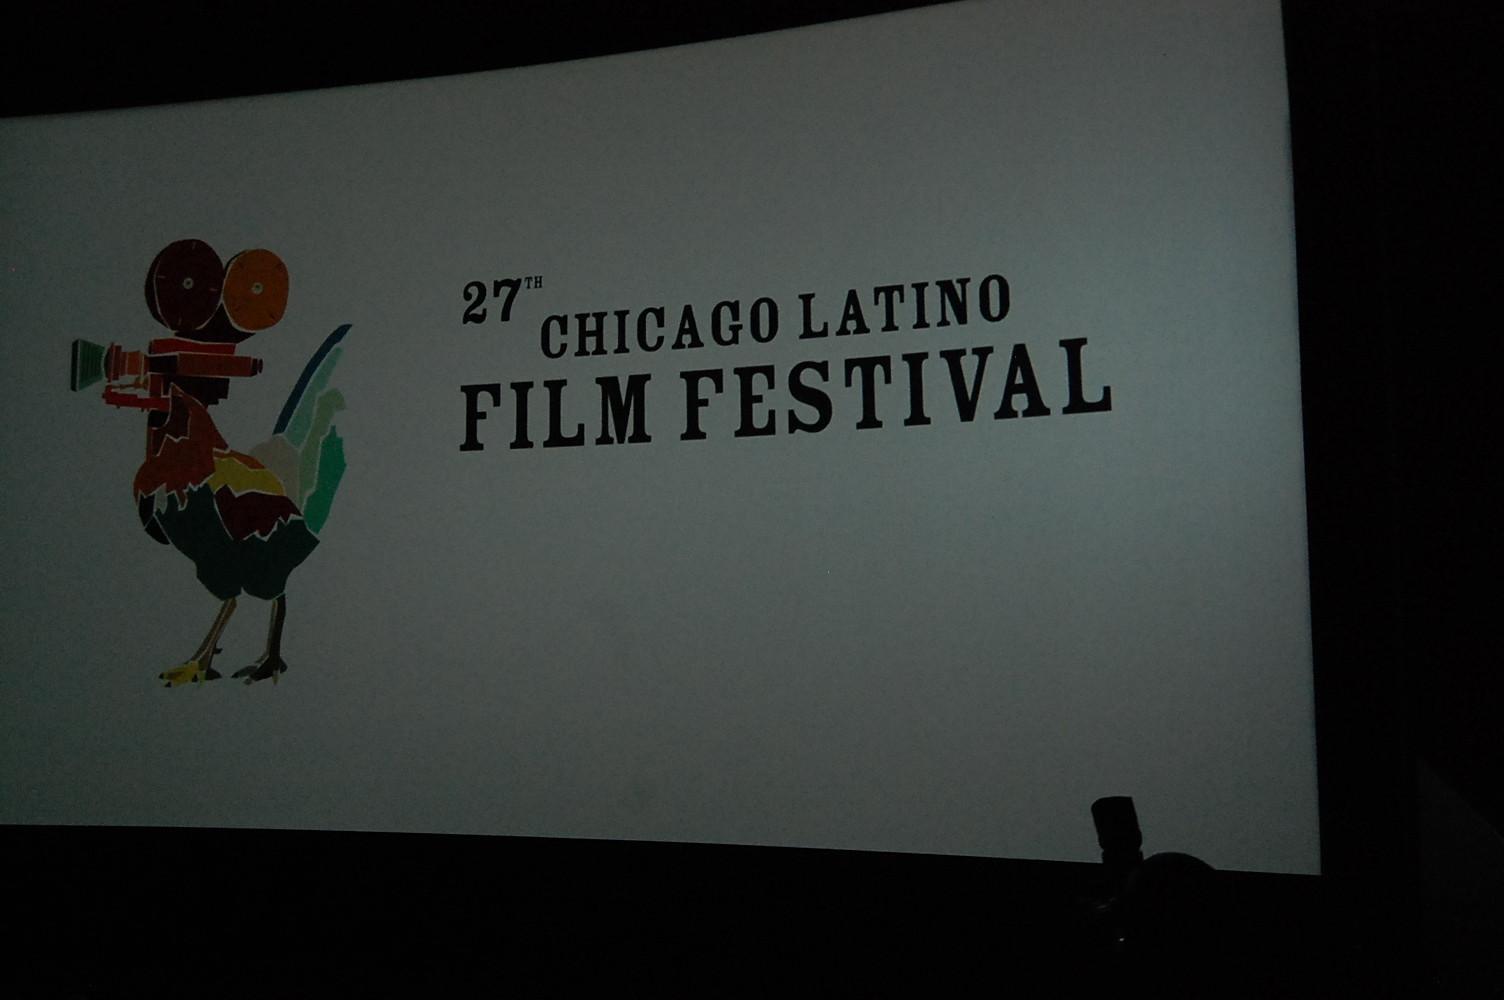 Opening Night: 27th Chicago Latino Film Festival